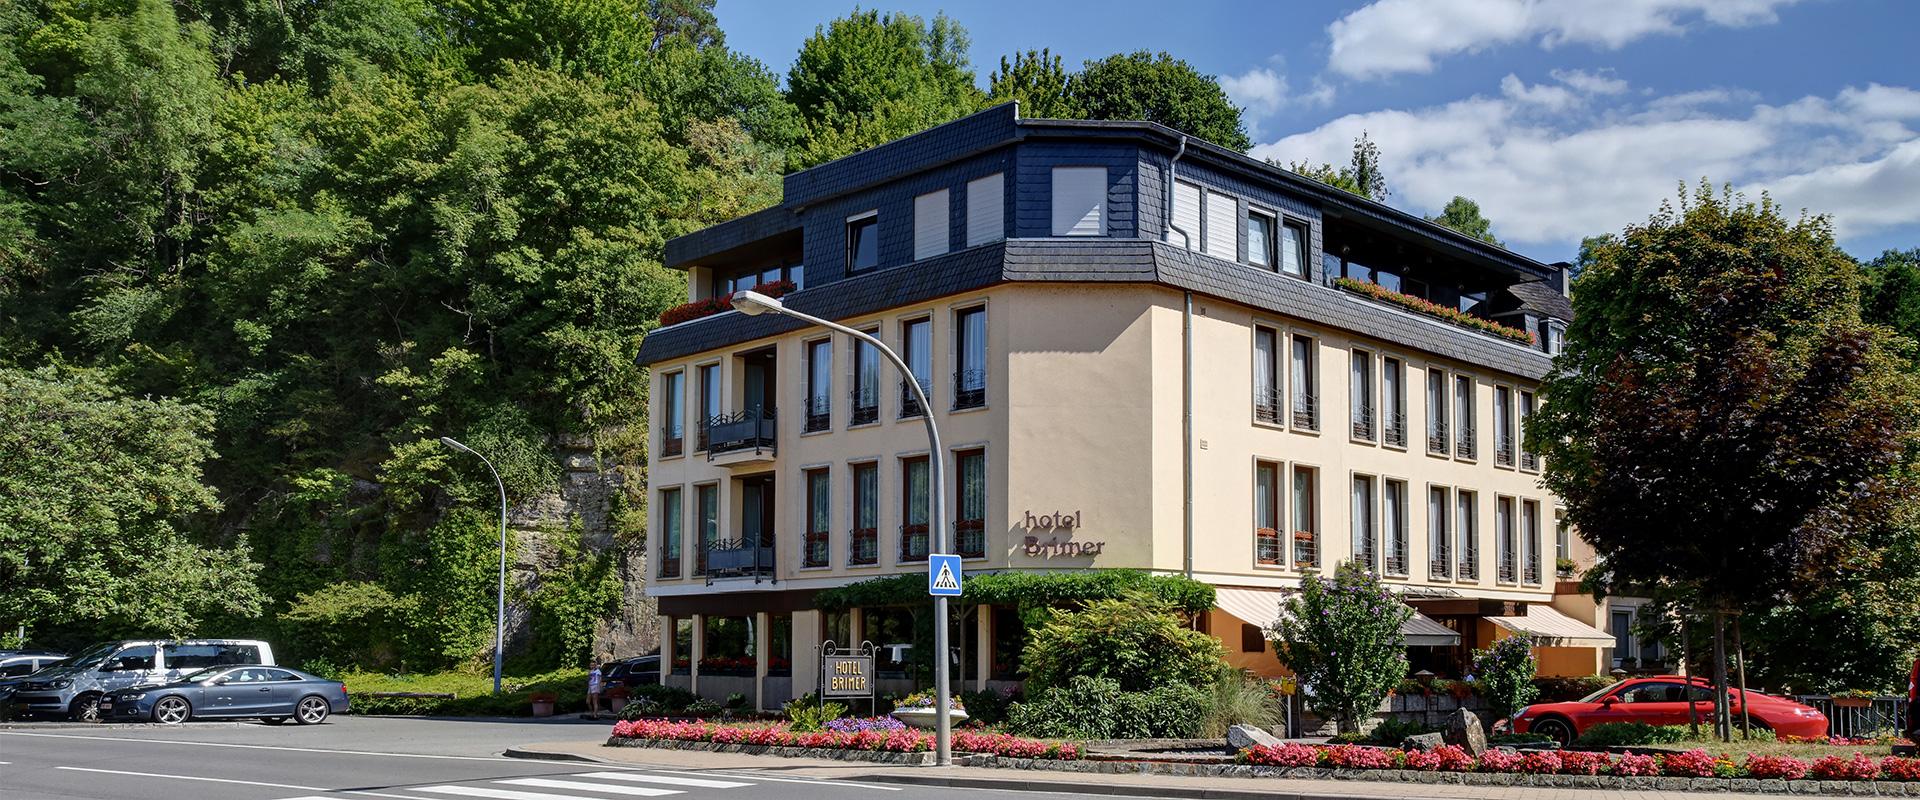 Home - Hotel Brimer